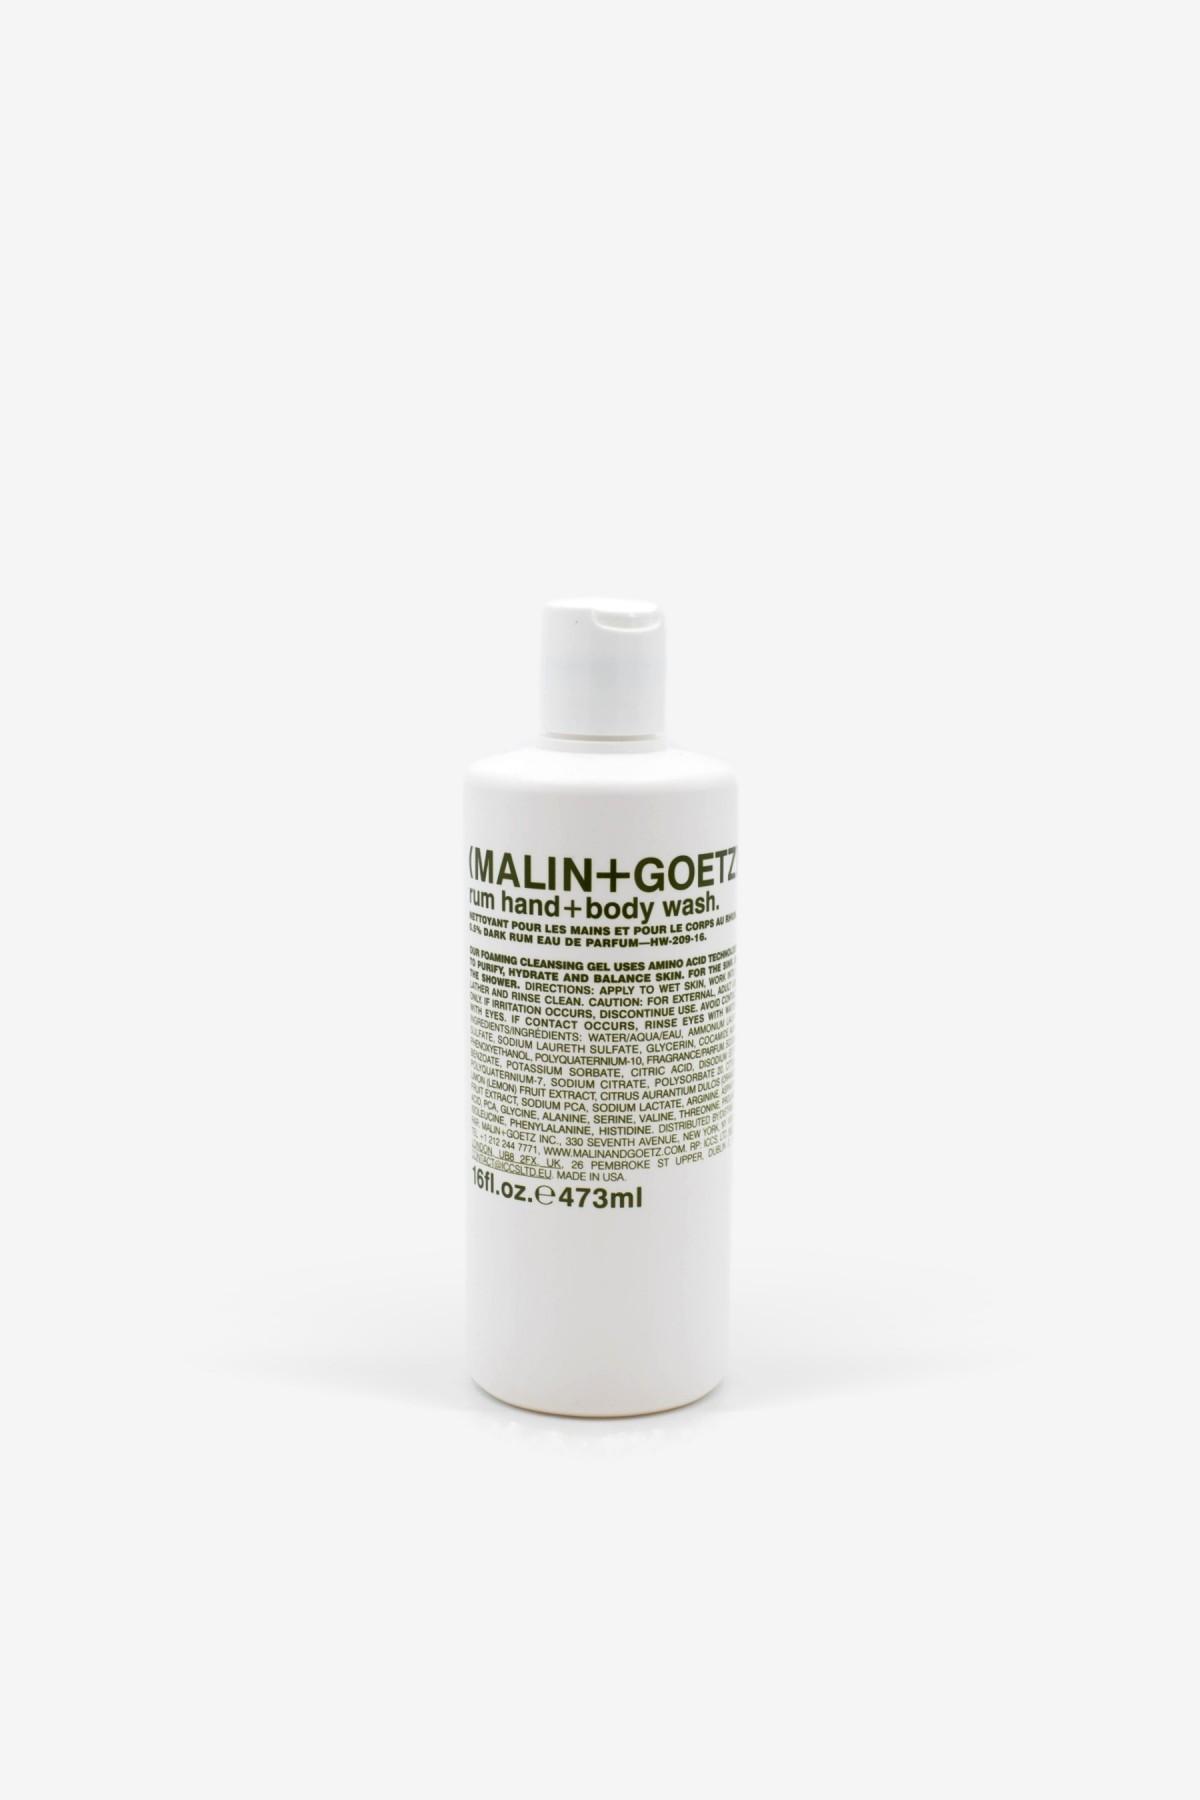 Malin+Goetz Rum Body Wash 473ml in